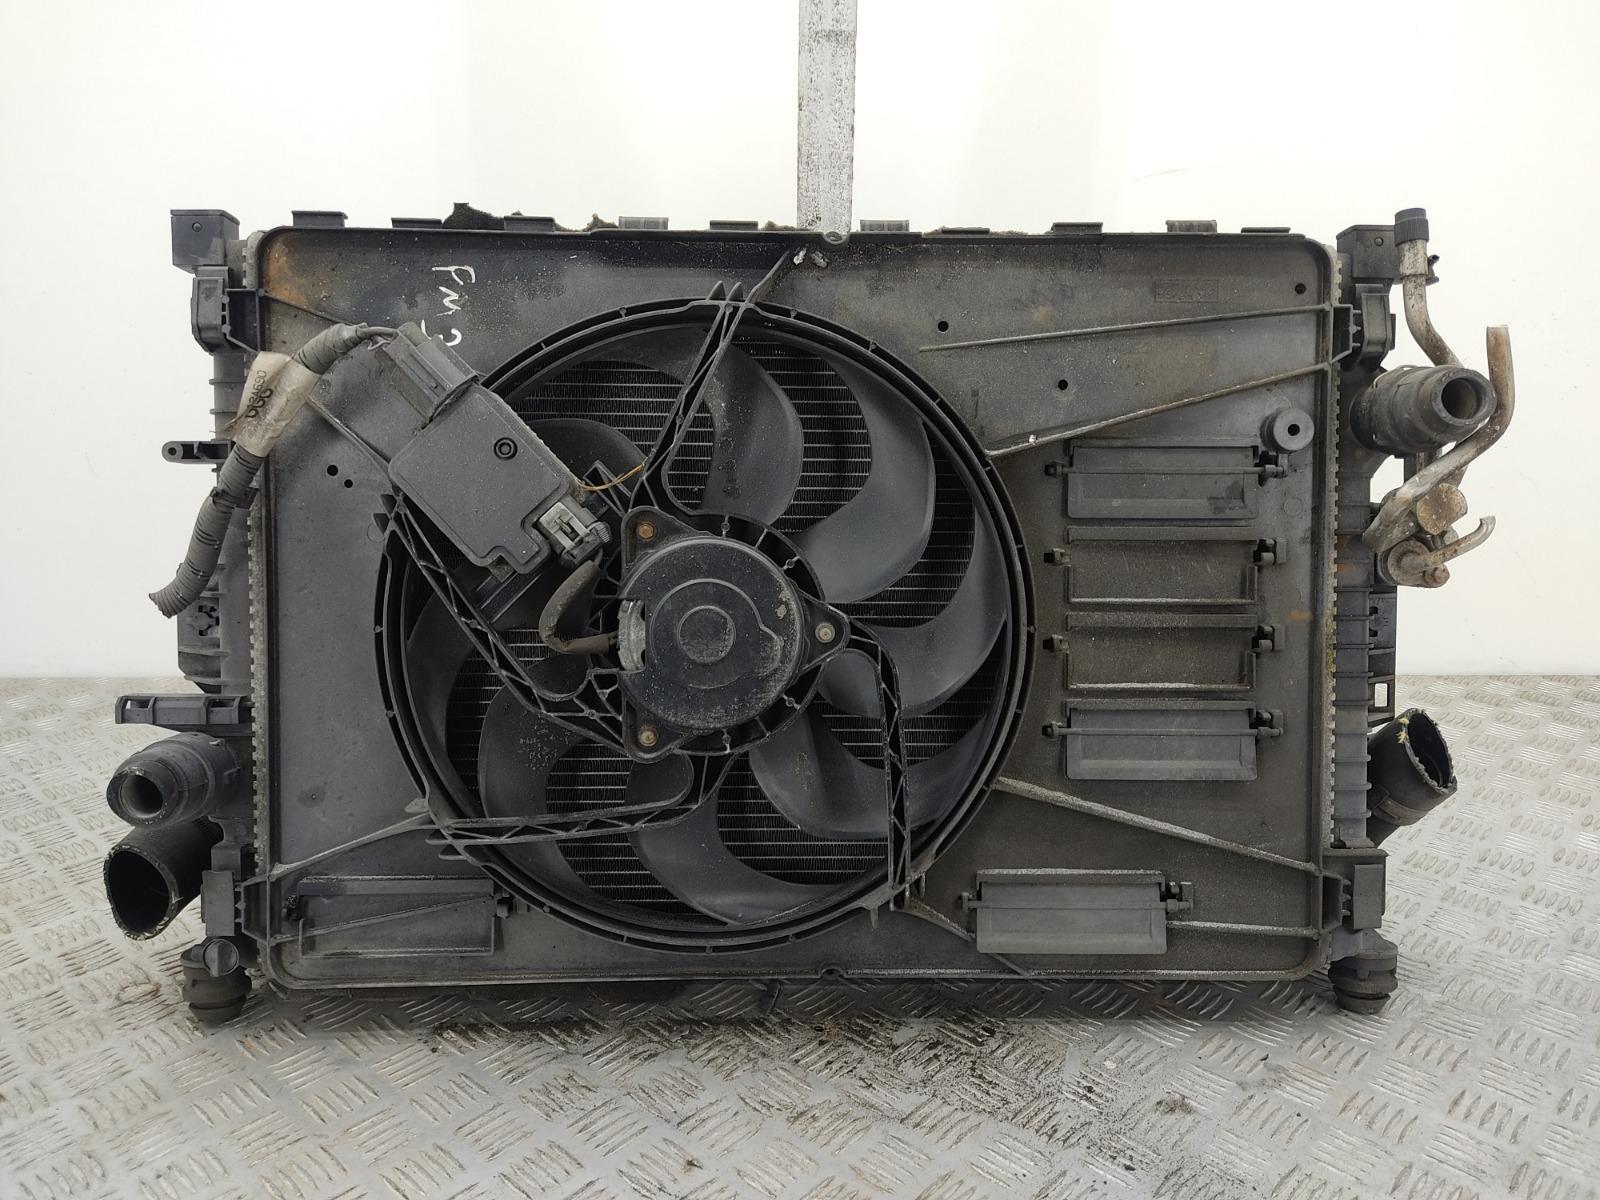 Кассета радиаторов Ford Mondeo 2.0 TDCI 2012 (б/у)